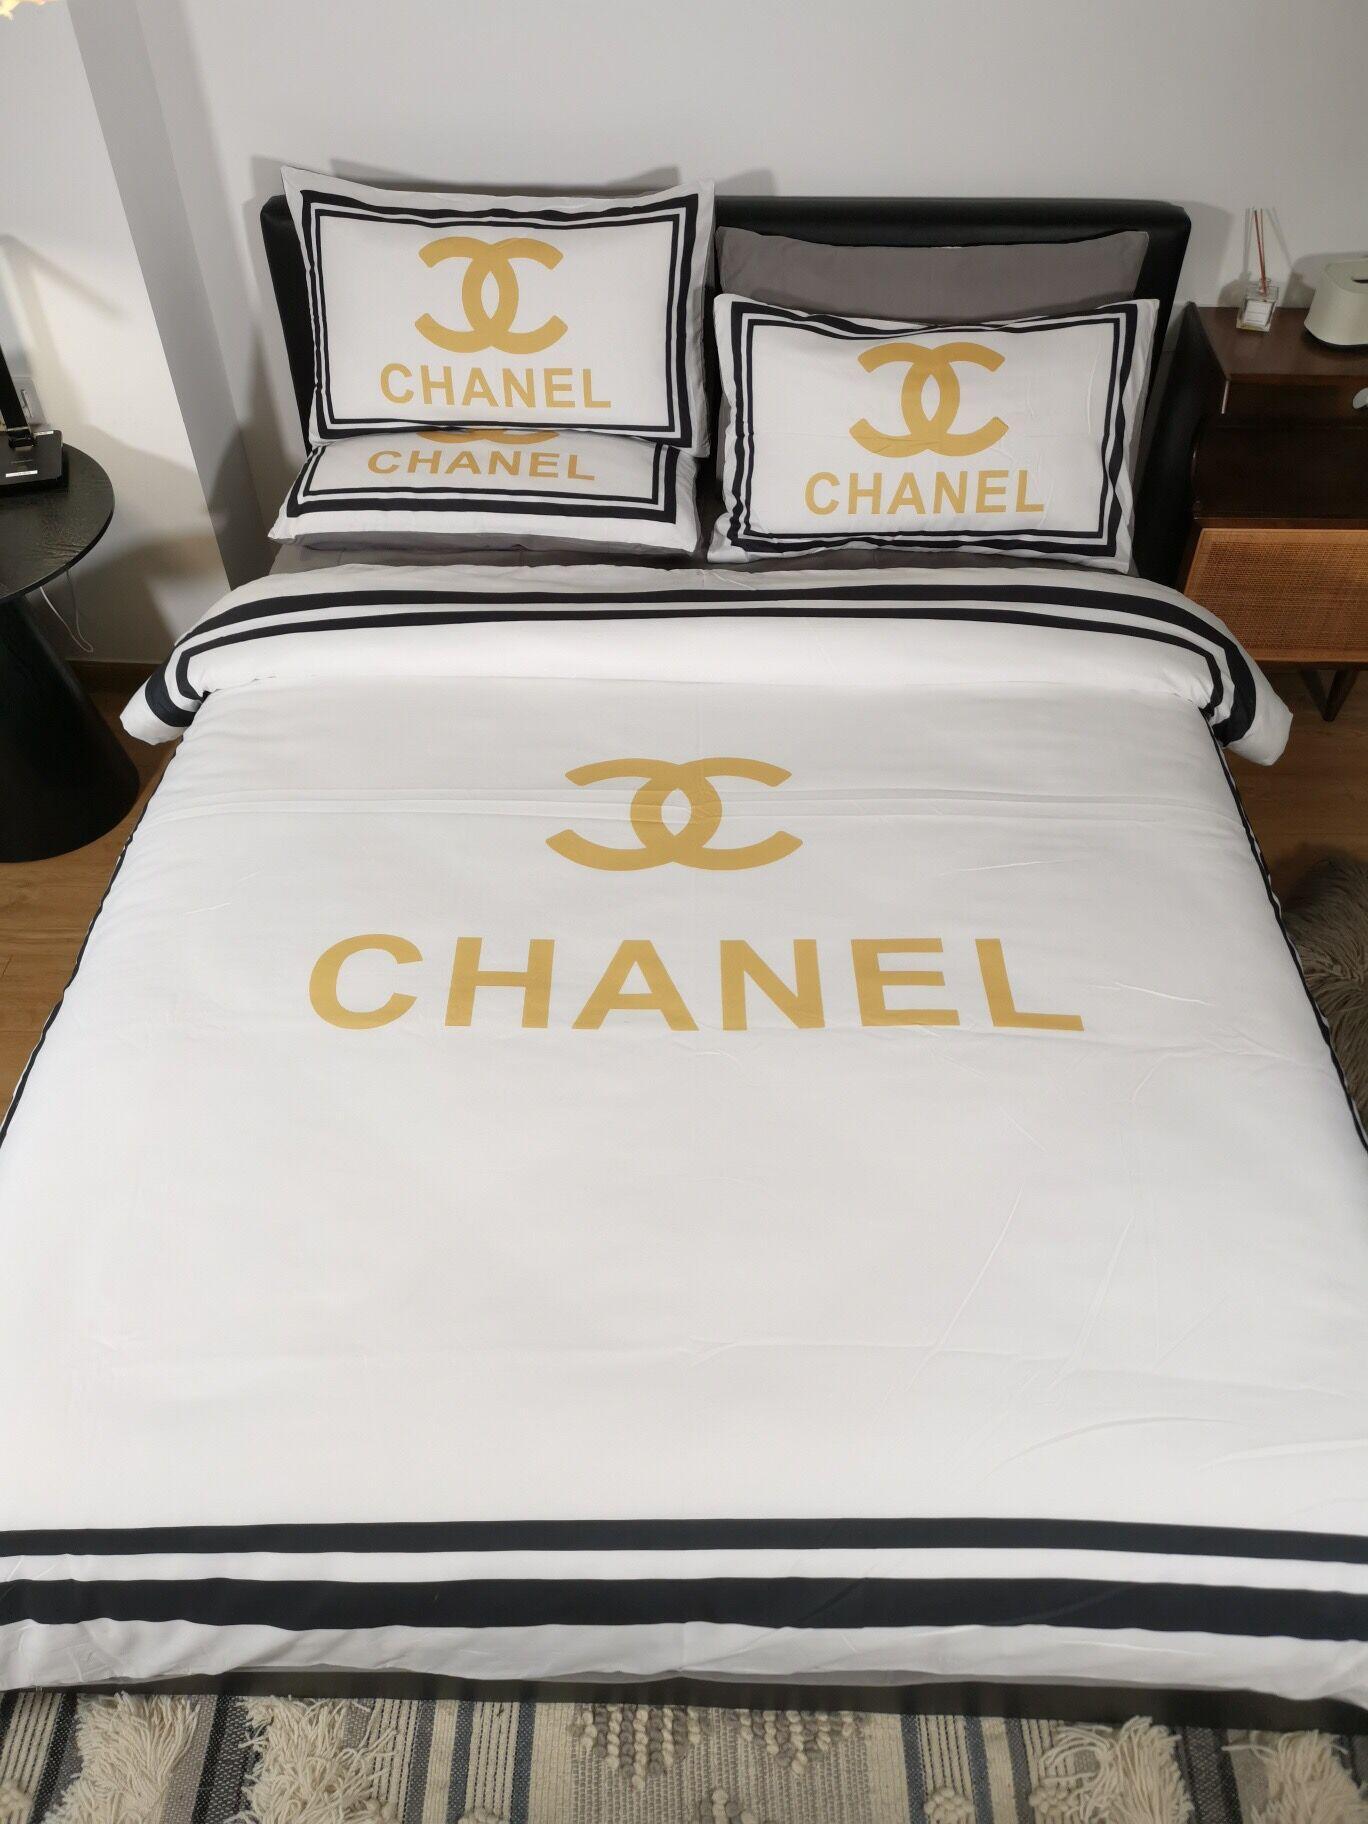 C C Queen Bed Comforters Sets White Gold Designer Pillow Cases Cotton Queen Size Home Decoration Fashion Designer Bedding Sets Cheap Queen Bedding Sets Duvet Cover Blue From Designer Home 104 16 Dhgate Com